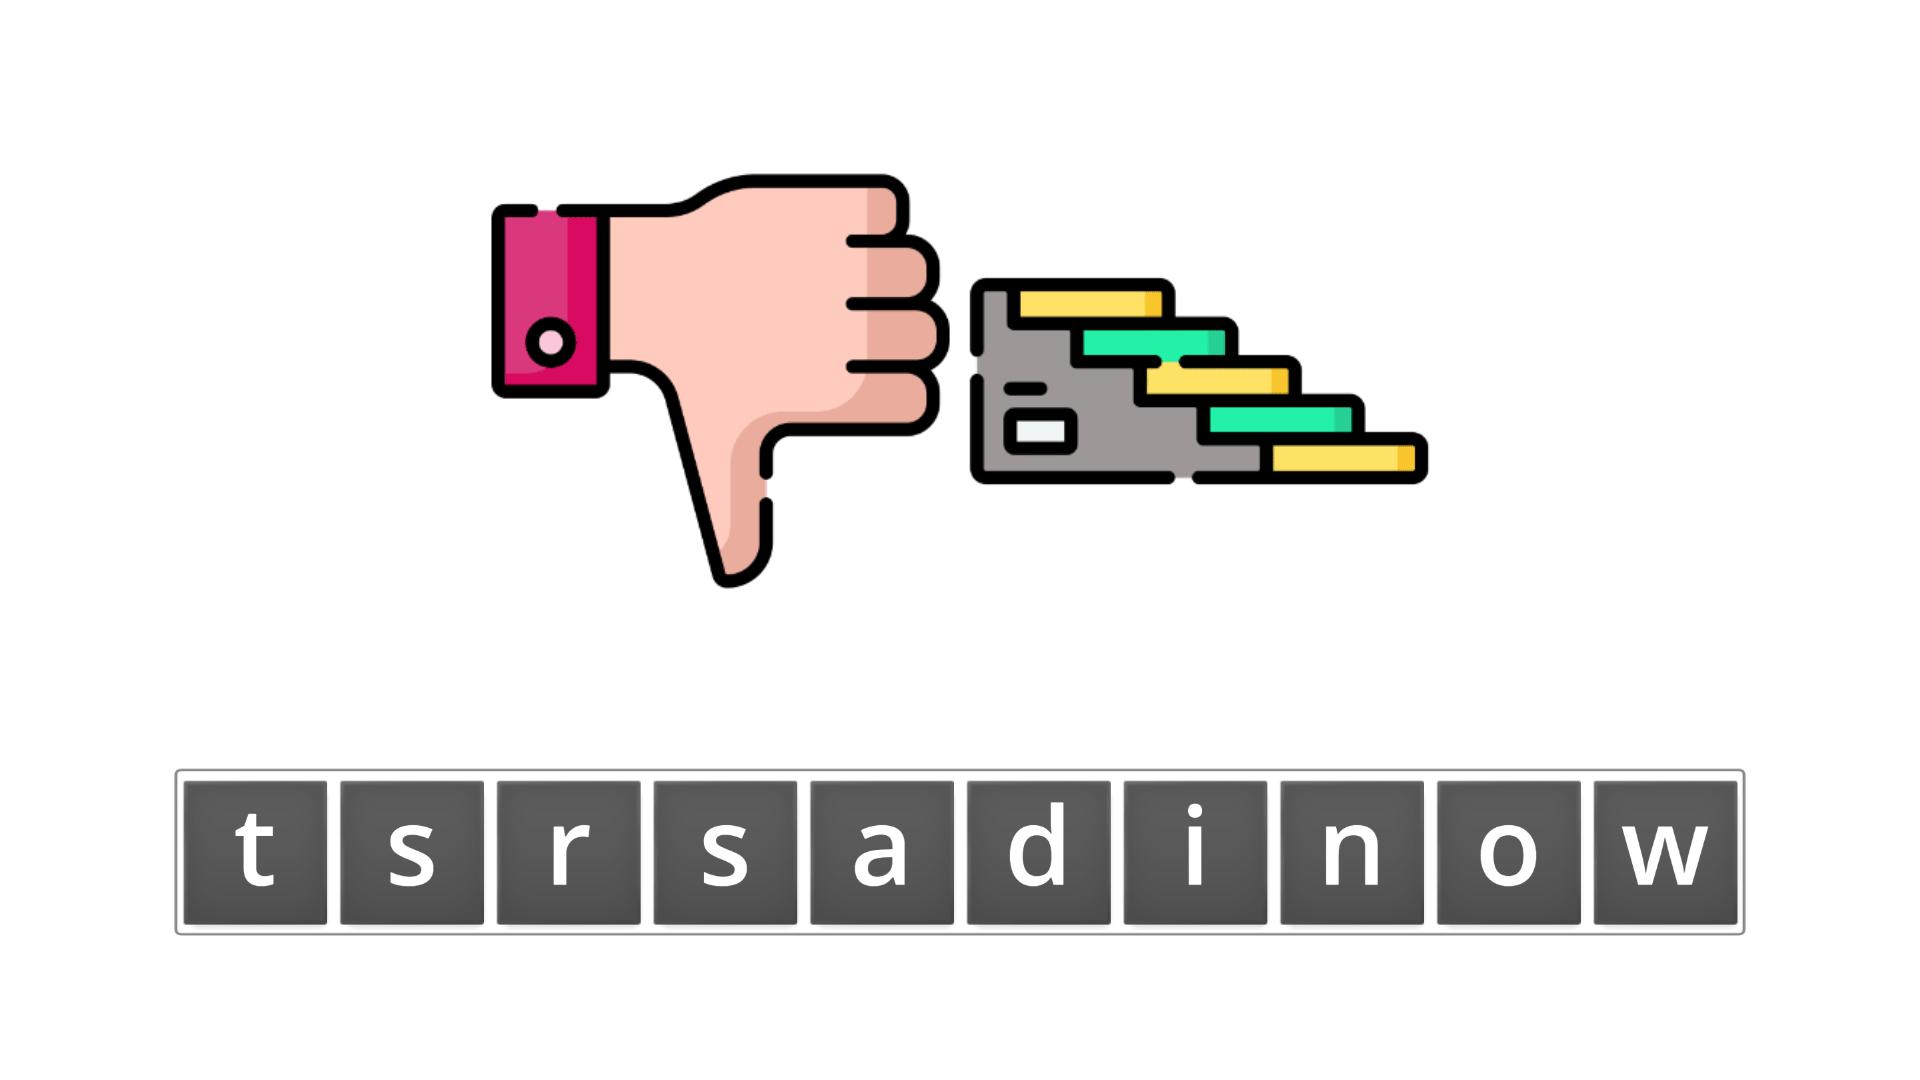 esl resources - flashcards - compound nouns  - unscramble - downstairs